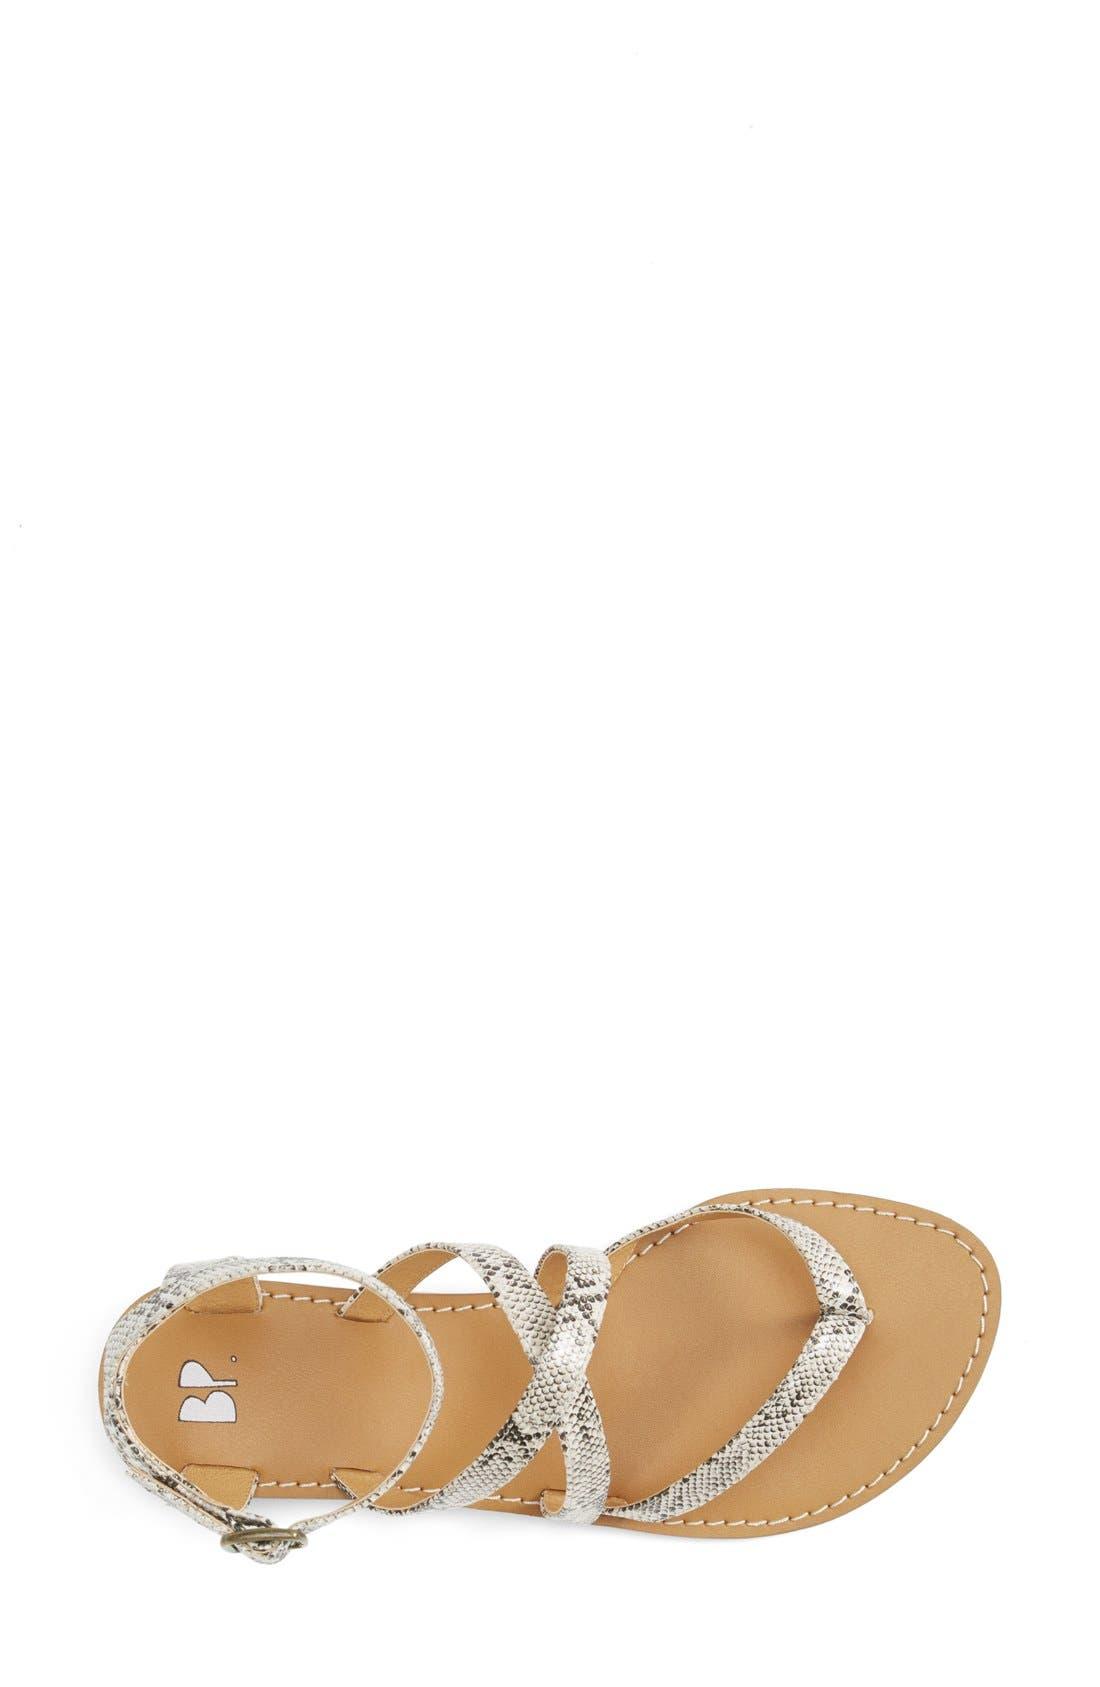 Alternate Image 3  - BP. 'Adriatic' Sandal (Women)